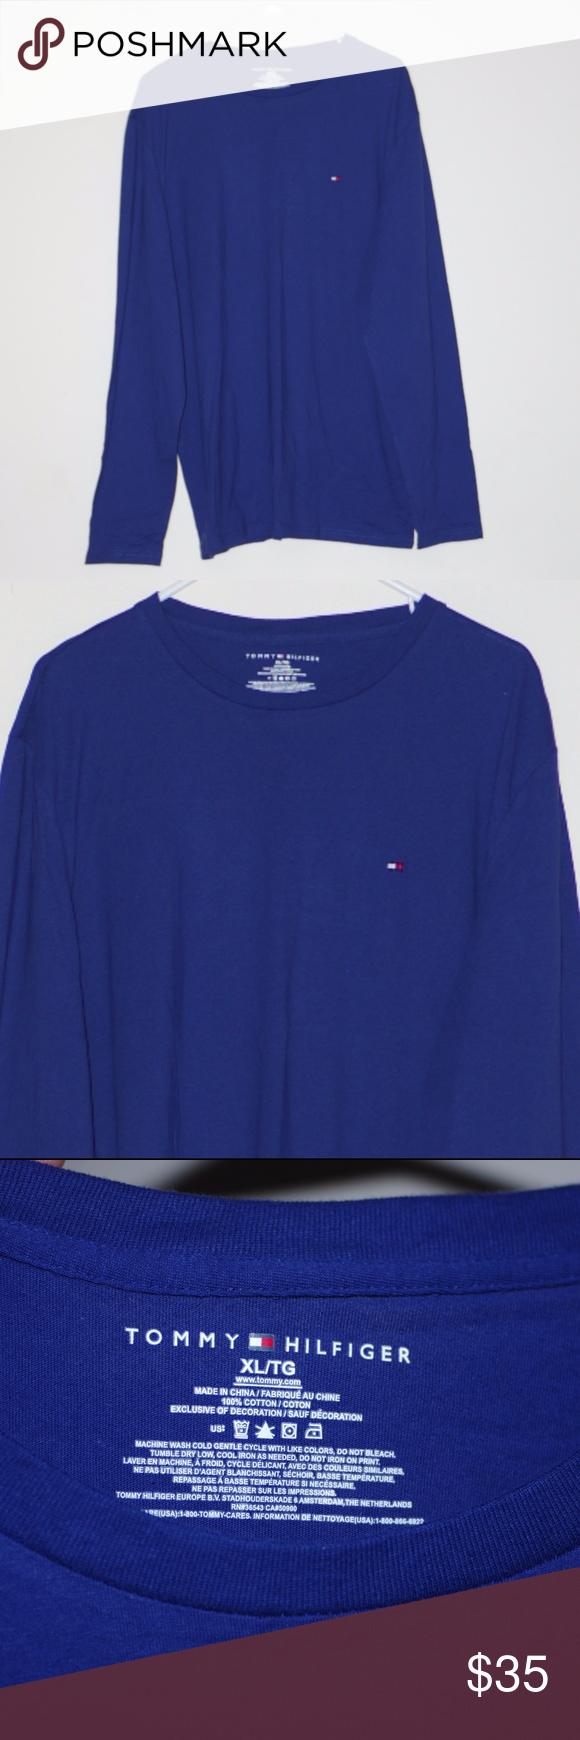 25fec6cee9ee Long Sleeved T Shirts · Unworn Tommy Hilfiger Super Soft Blue Long Sleeve  Unworn Tommy Hilfiger Super Soft Blue Long Sleeve